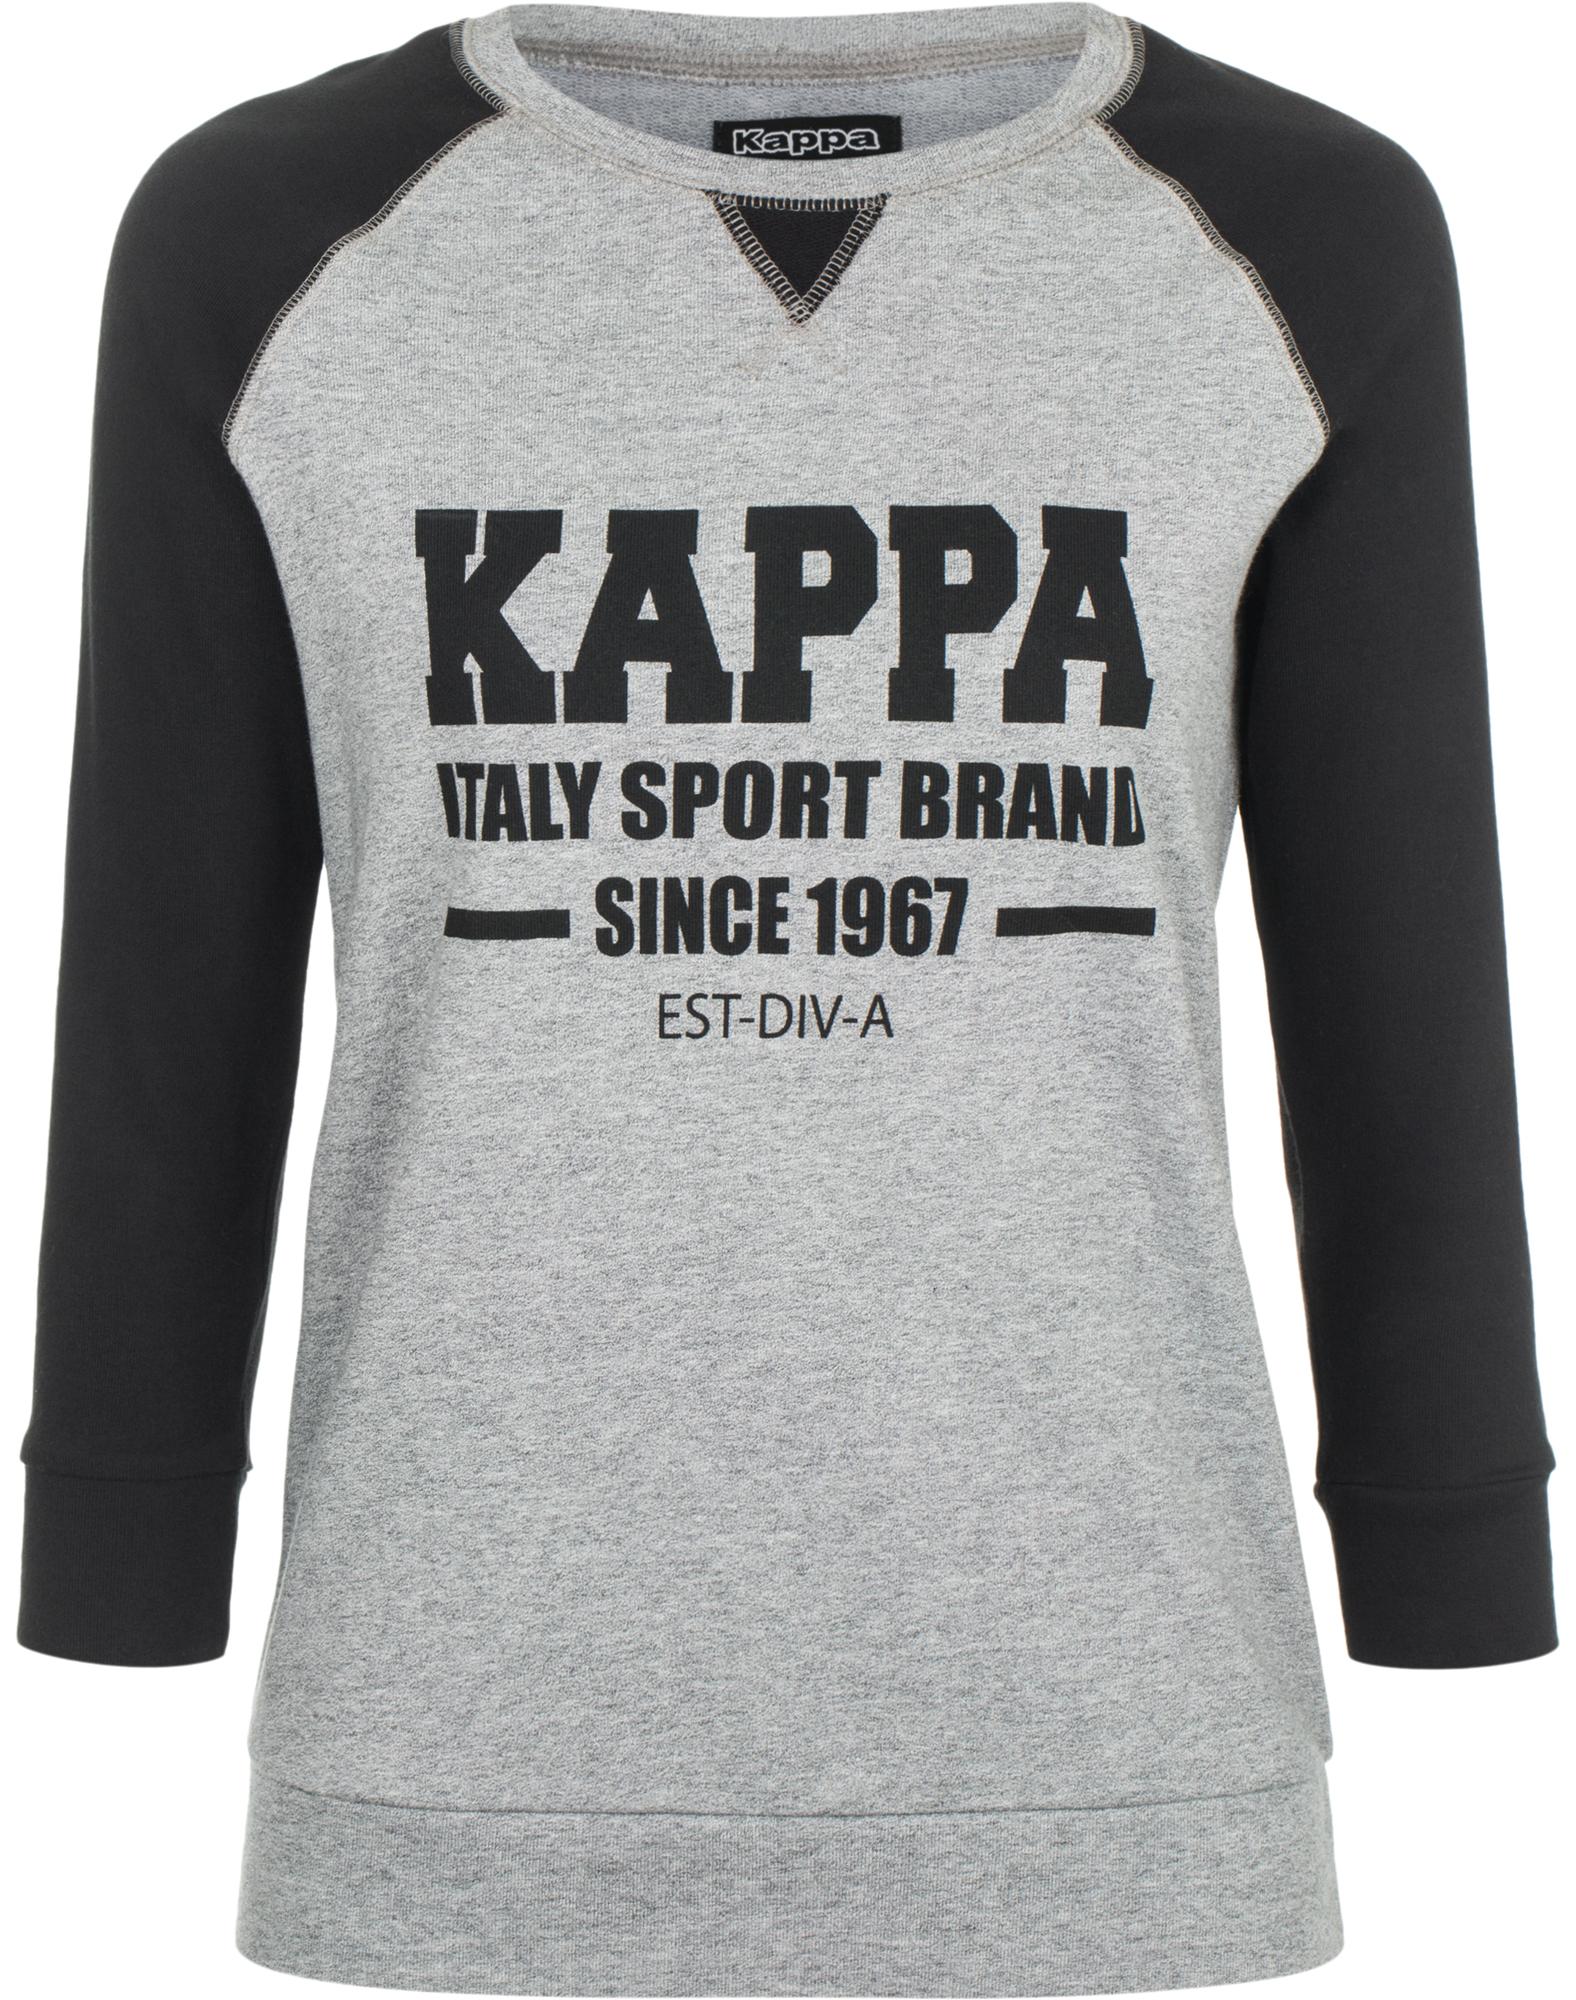 Kappa Джемпер женский Kappa kappa жилет утепленный женский kappa